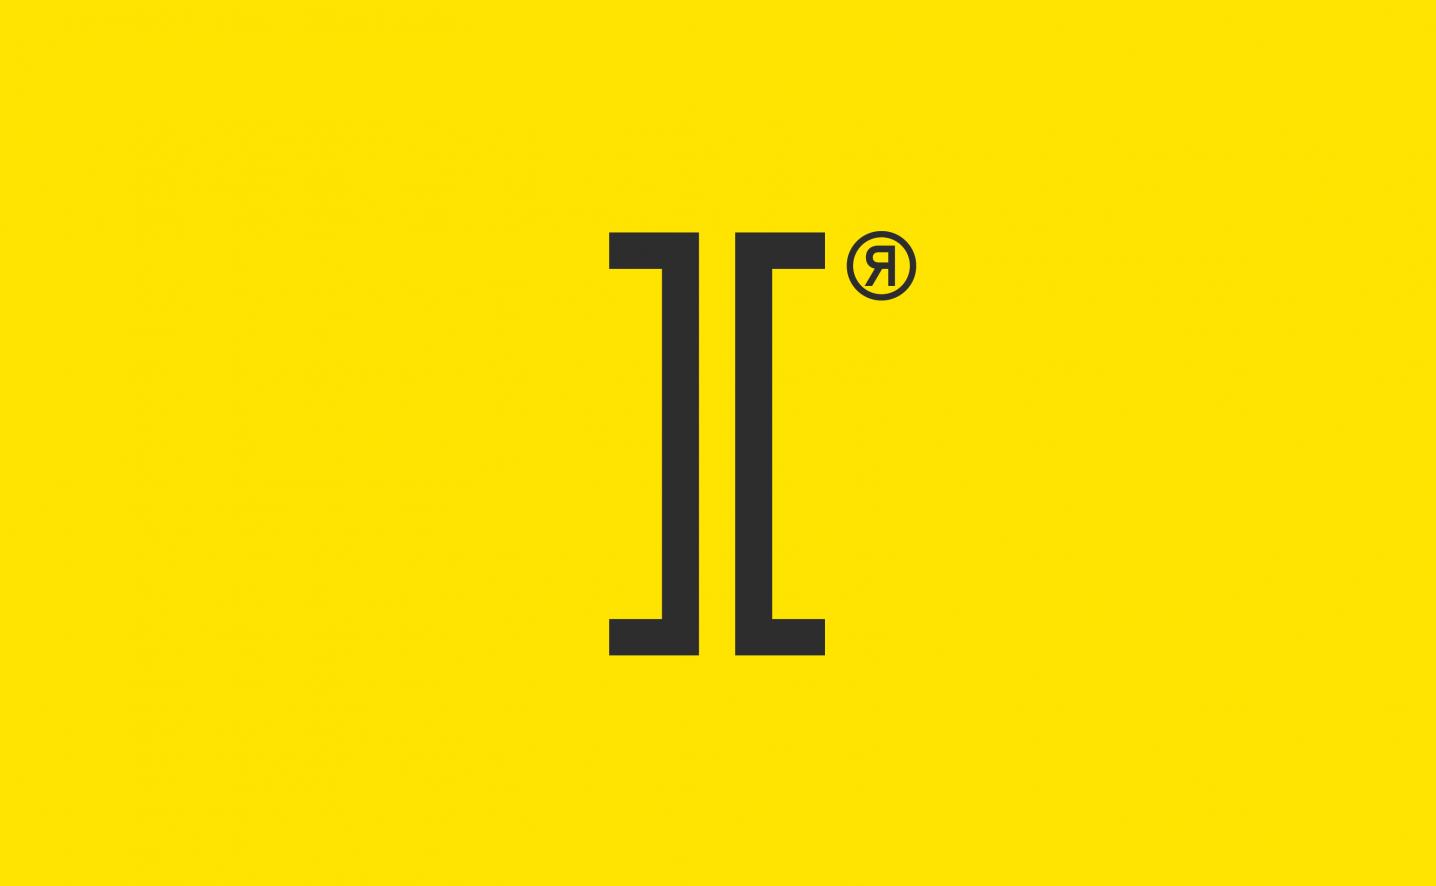 IC logo design